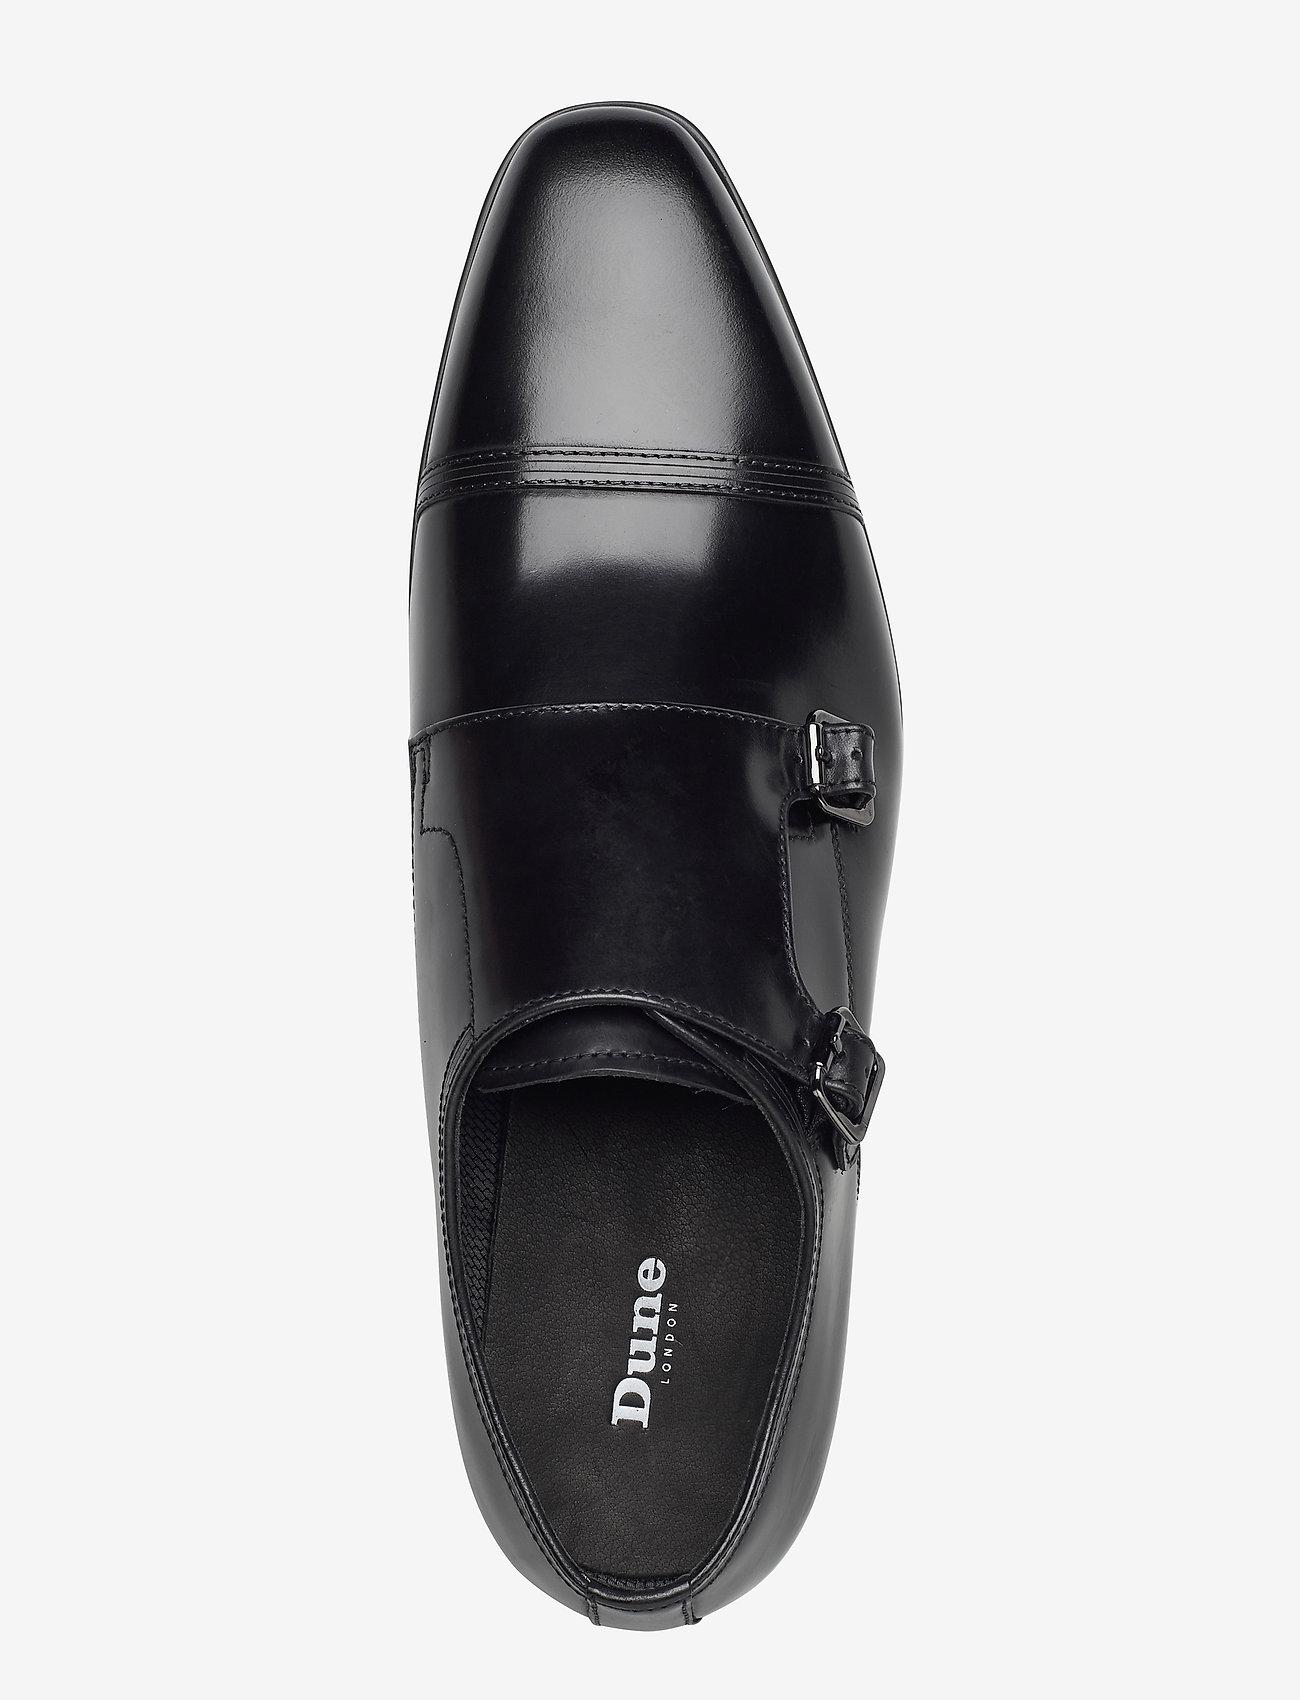 Surfer (Black Leather) (101.50 €) - Dune London 1Kwo8